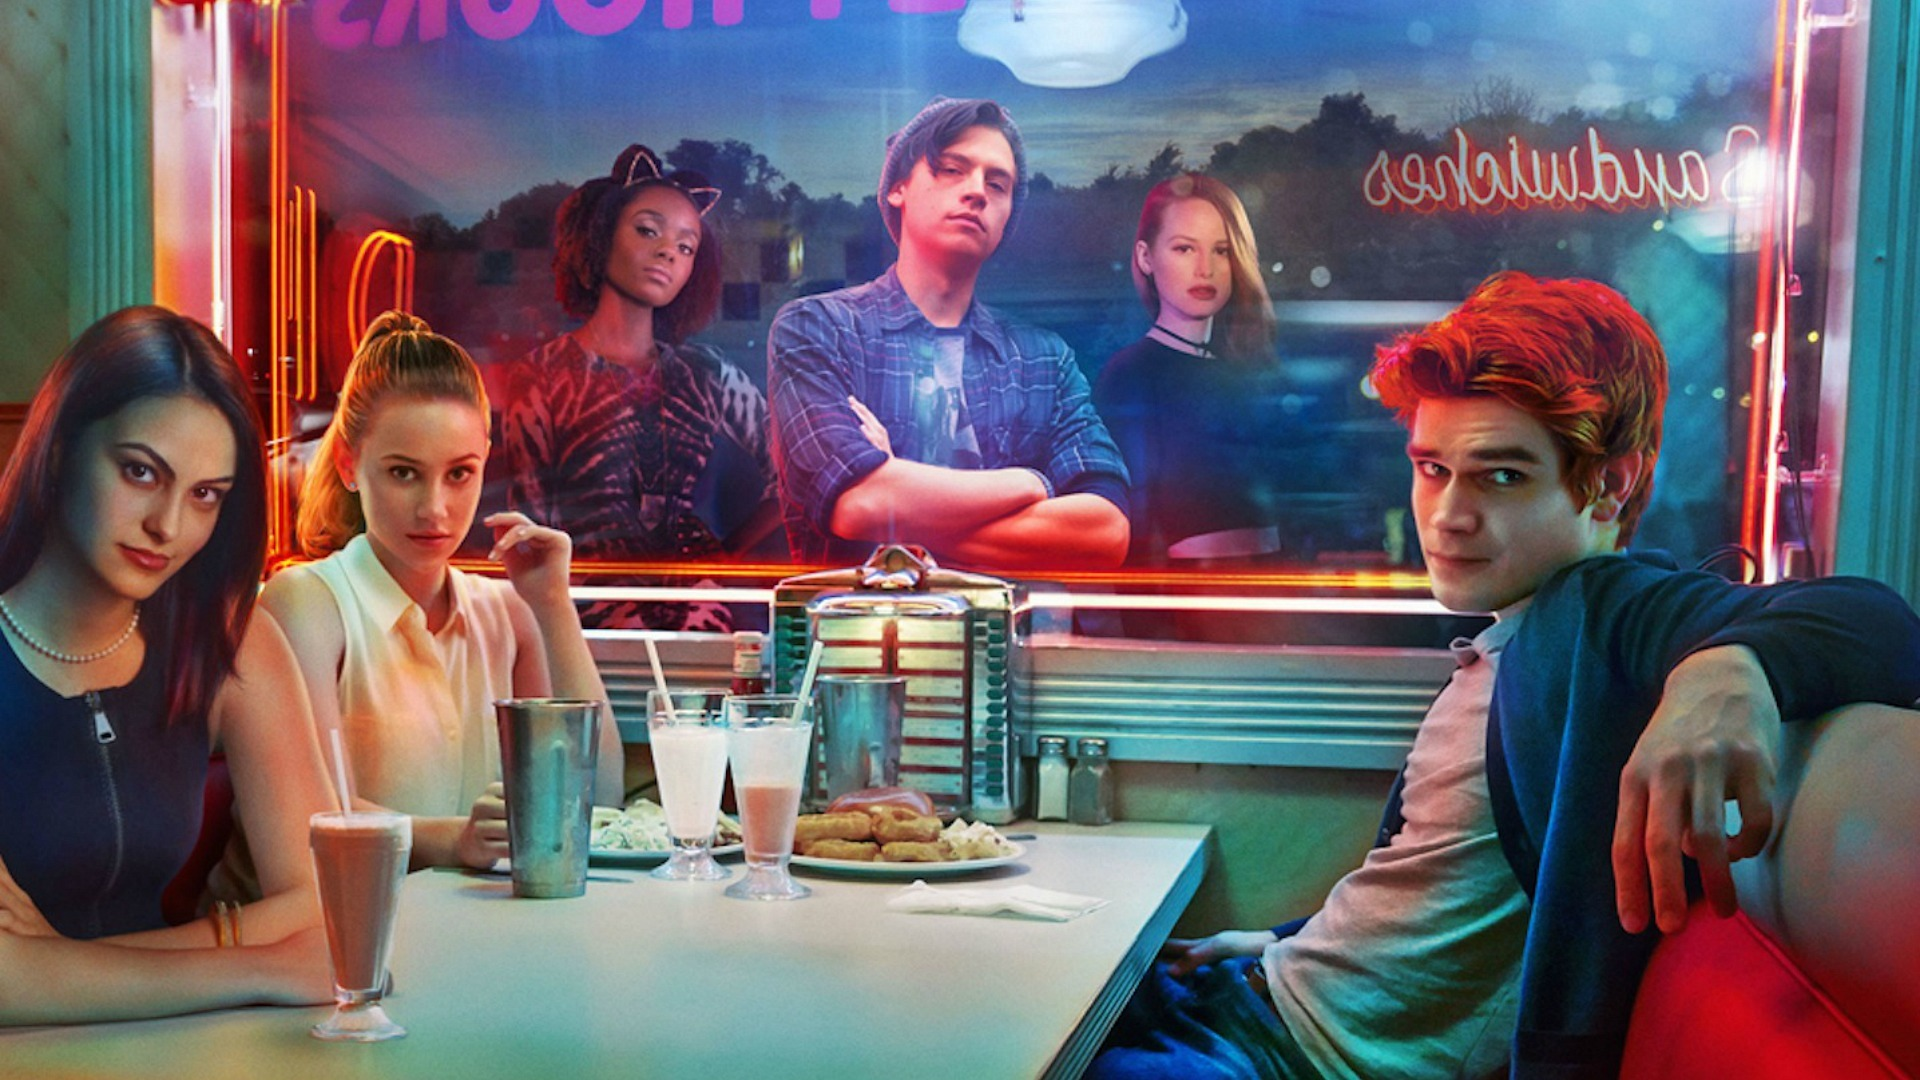 Riverdale Wallpaper Hd - Archie Show Netflix , HD Wallpaper & Backgrounds